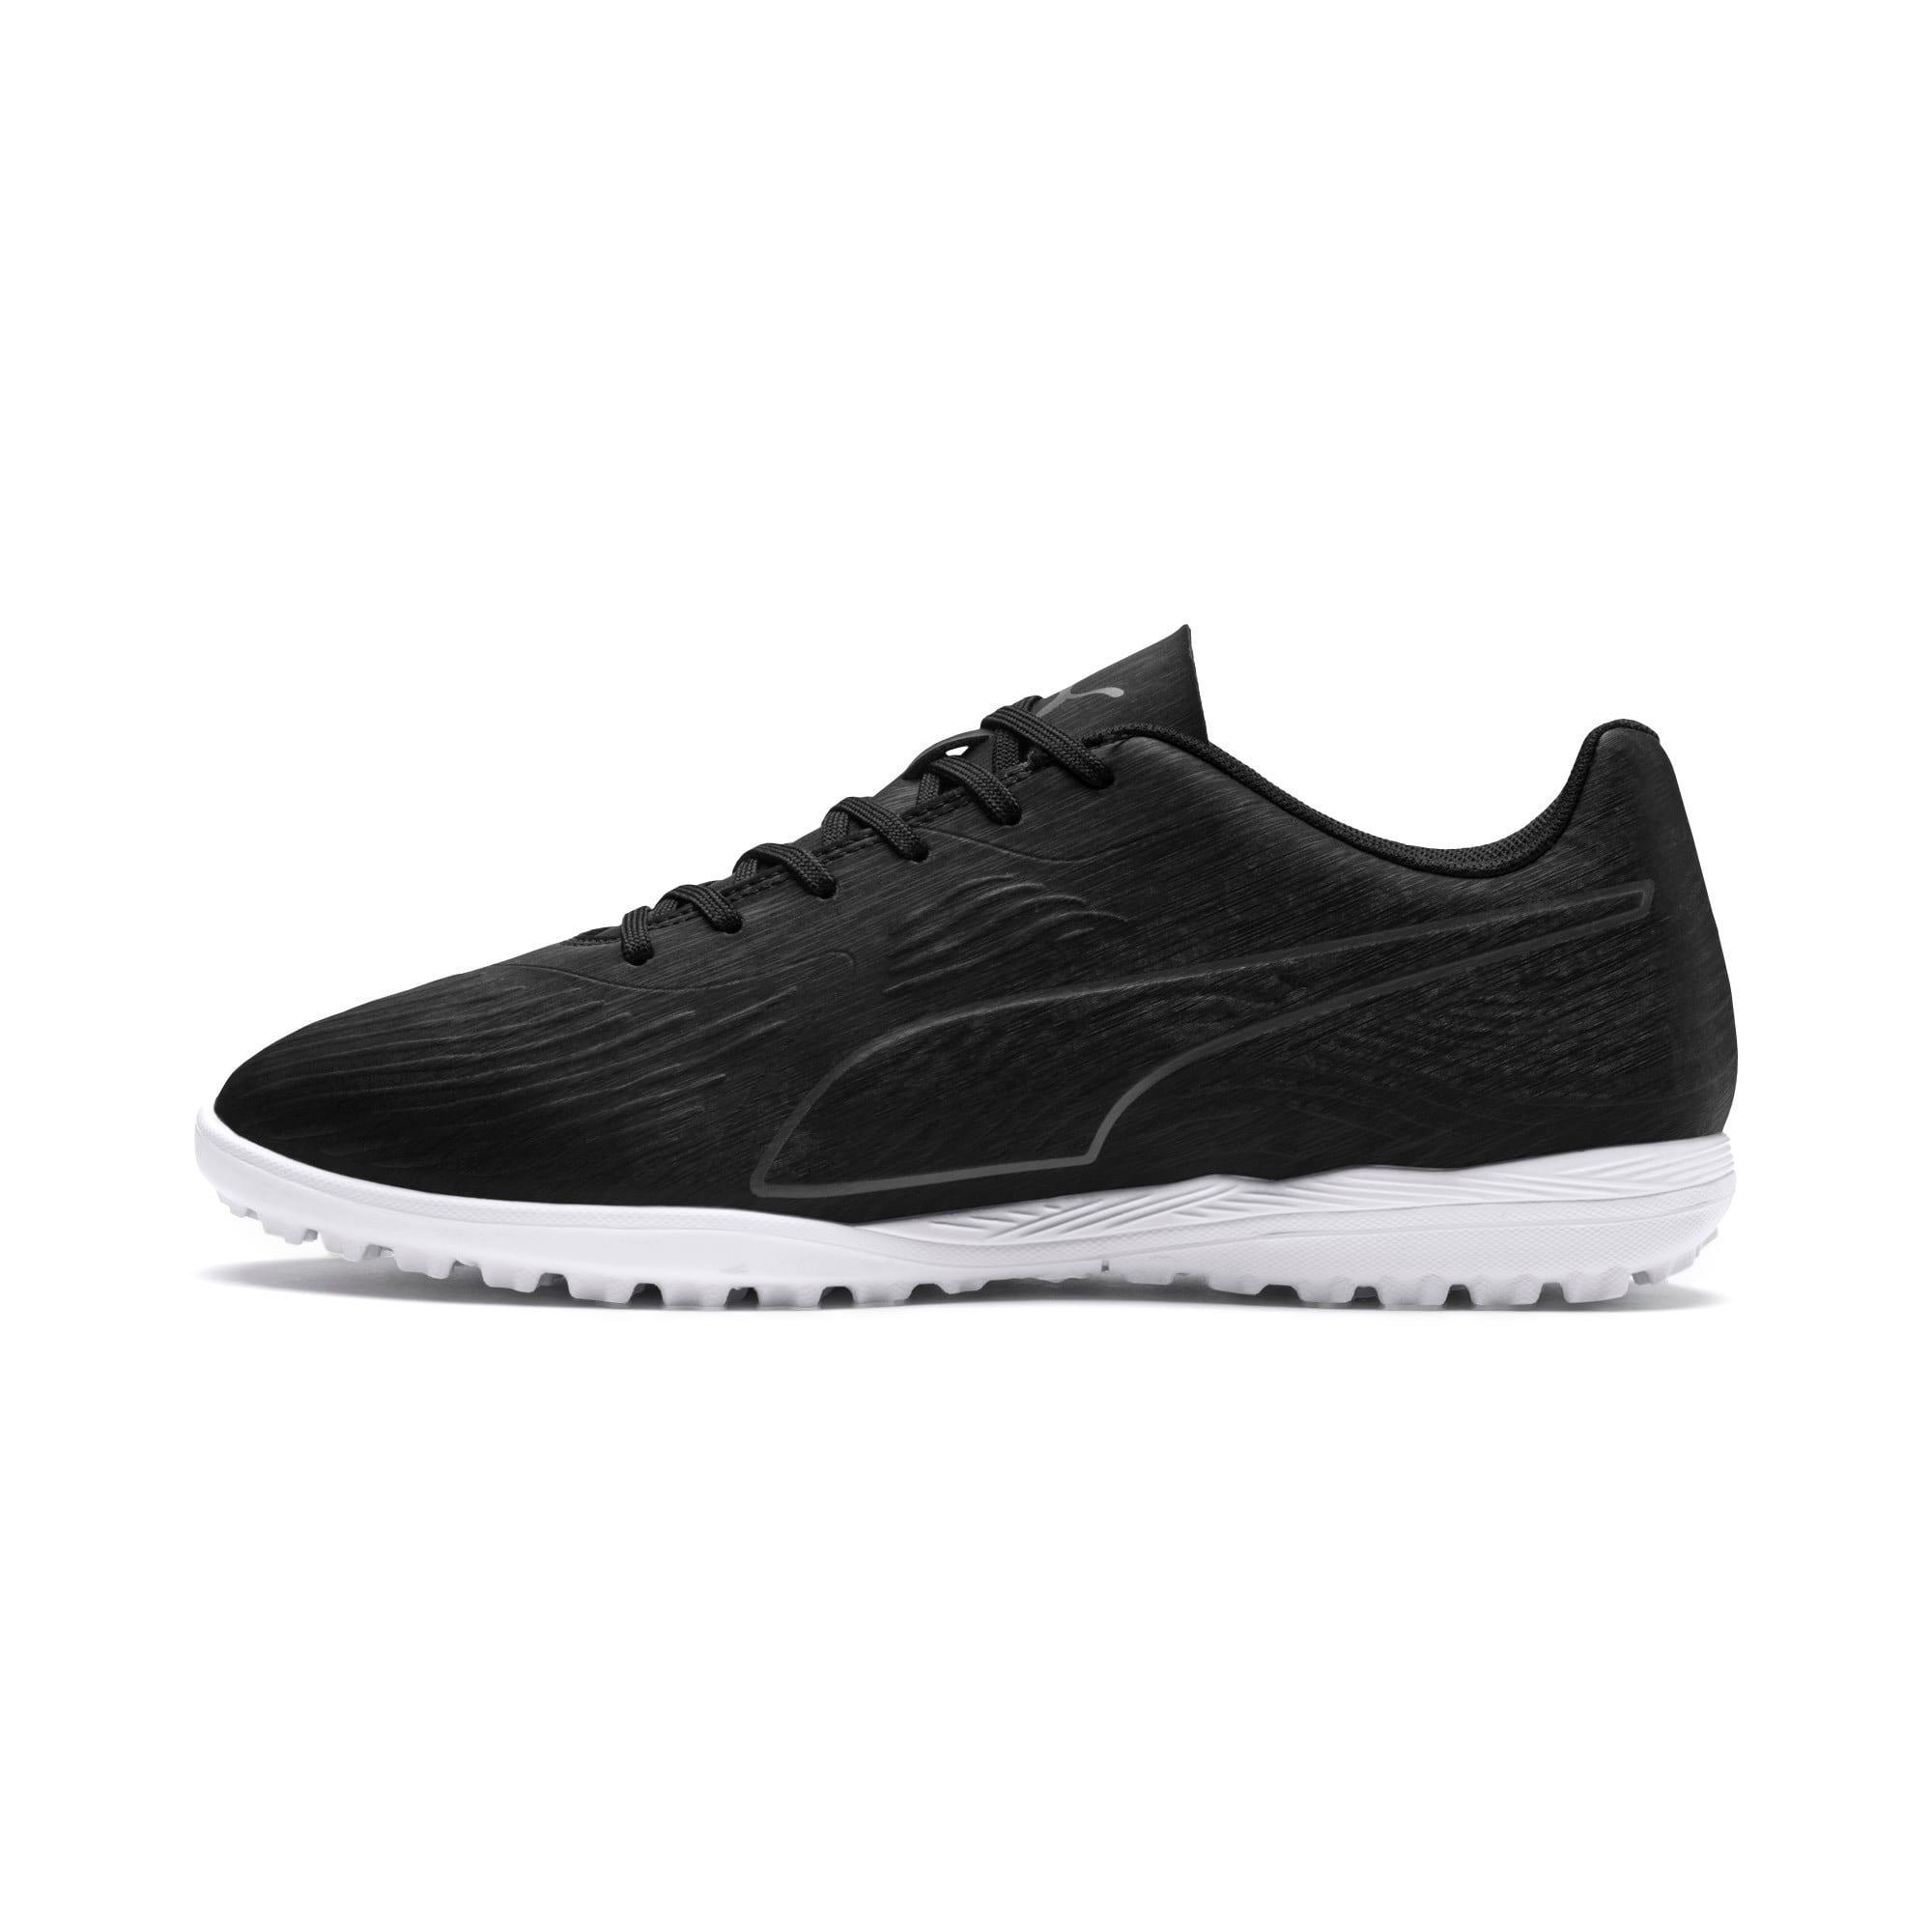 Thumbnail 1 of PUMA ONE 19.4 TT Men's Soccer Shoes, Puma Black-Puma Black-White, medium